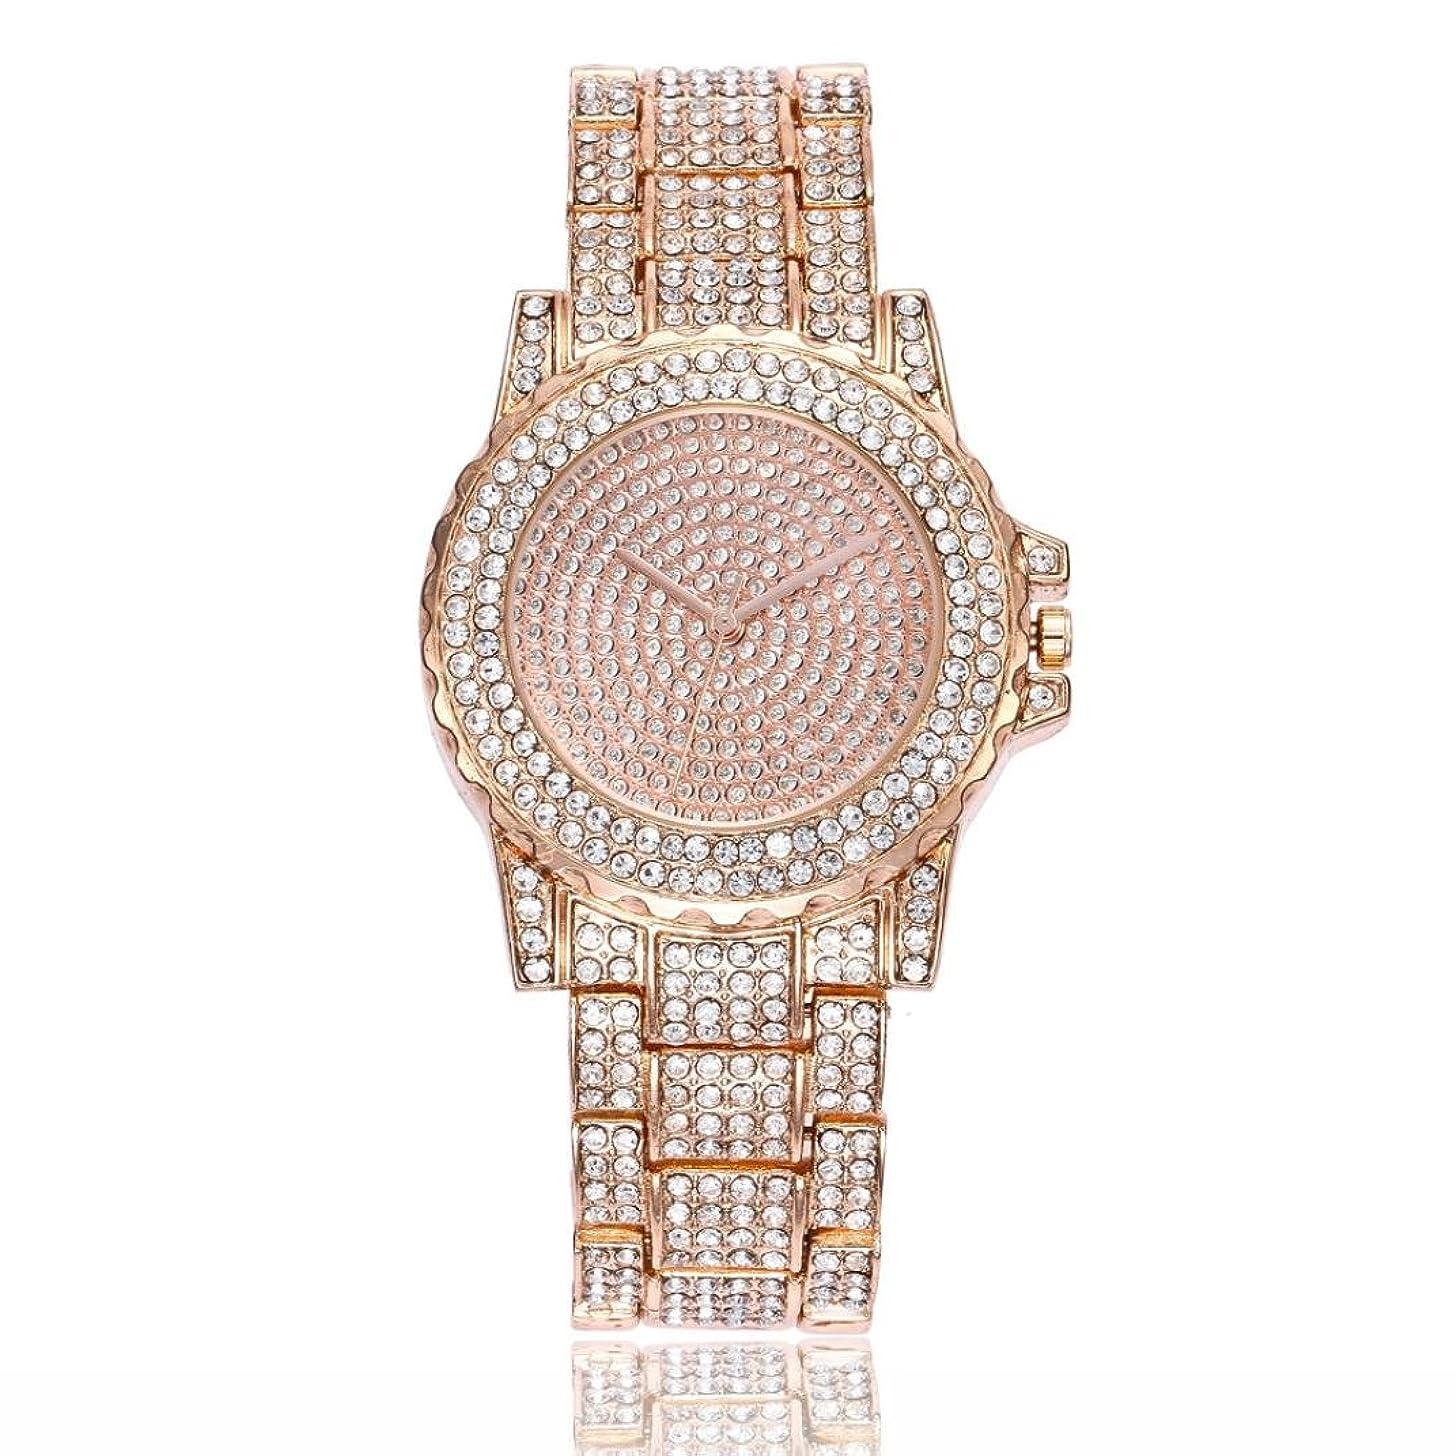 Swyss Women Fashion Trend Watch diamond Luxury Analog Quartz Round Wrist Watch Chic Temperament Jewelry (Rose Gold)